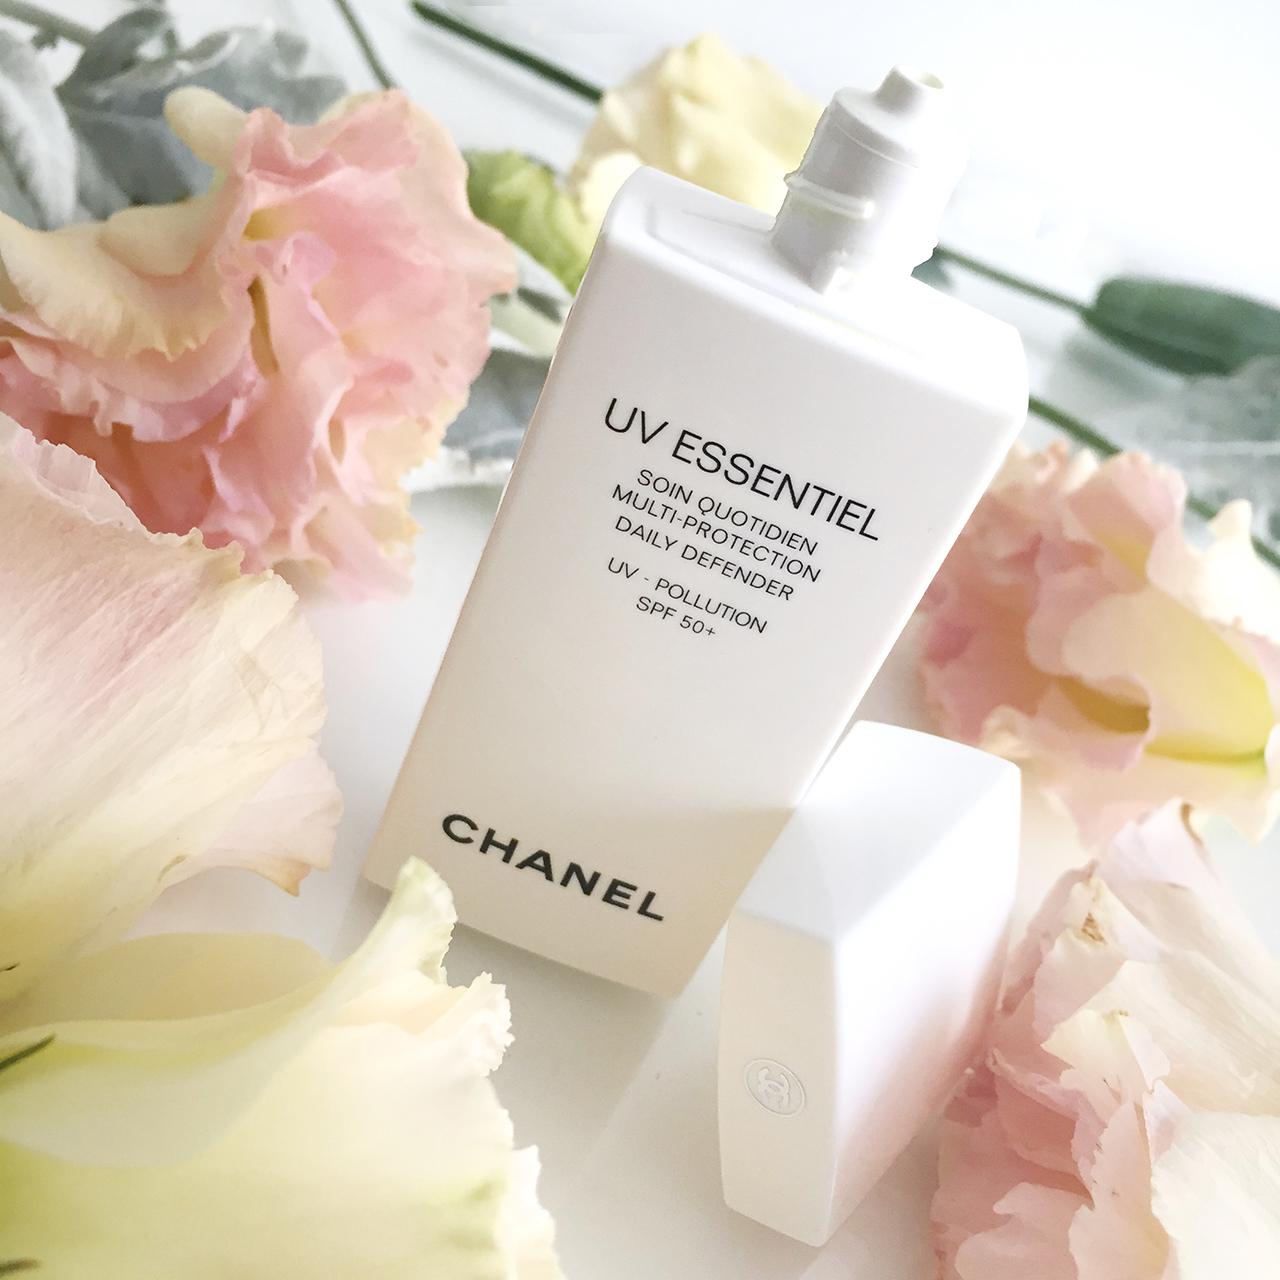 Chanel UV Essentiel SPF50+